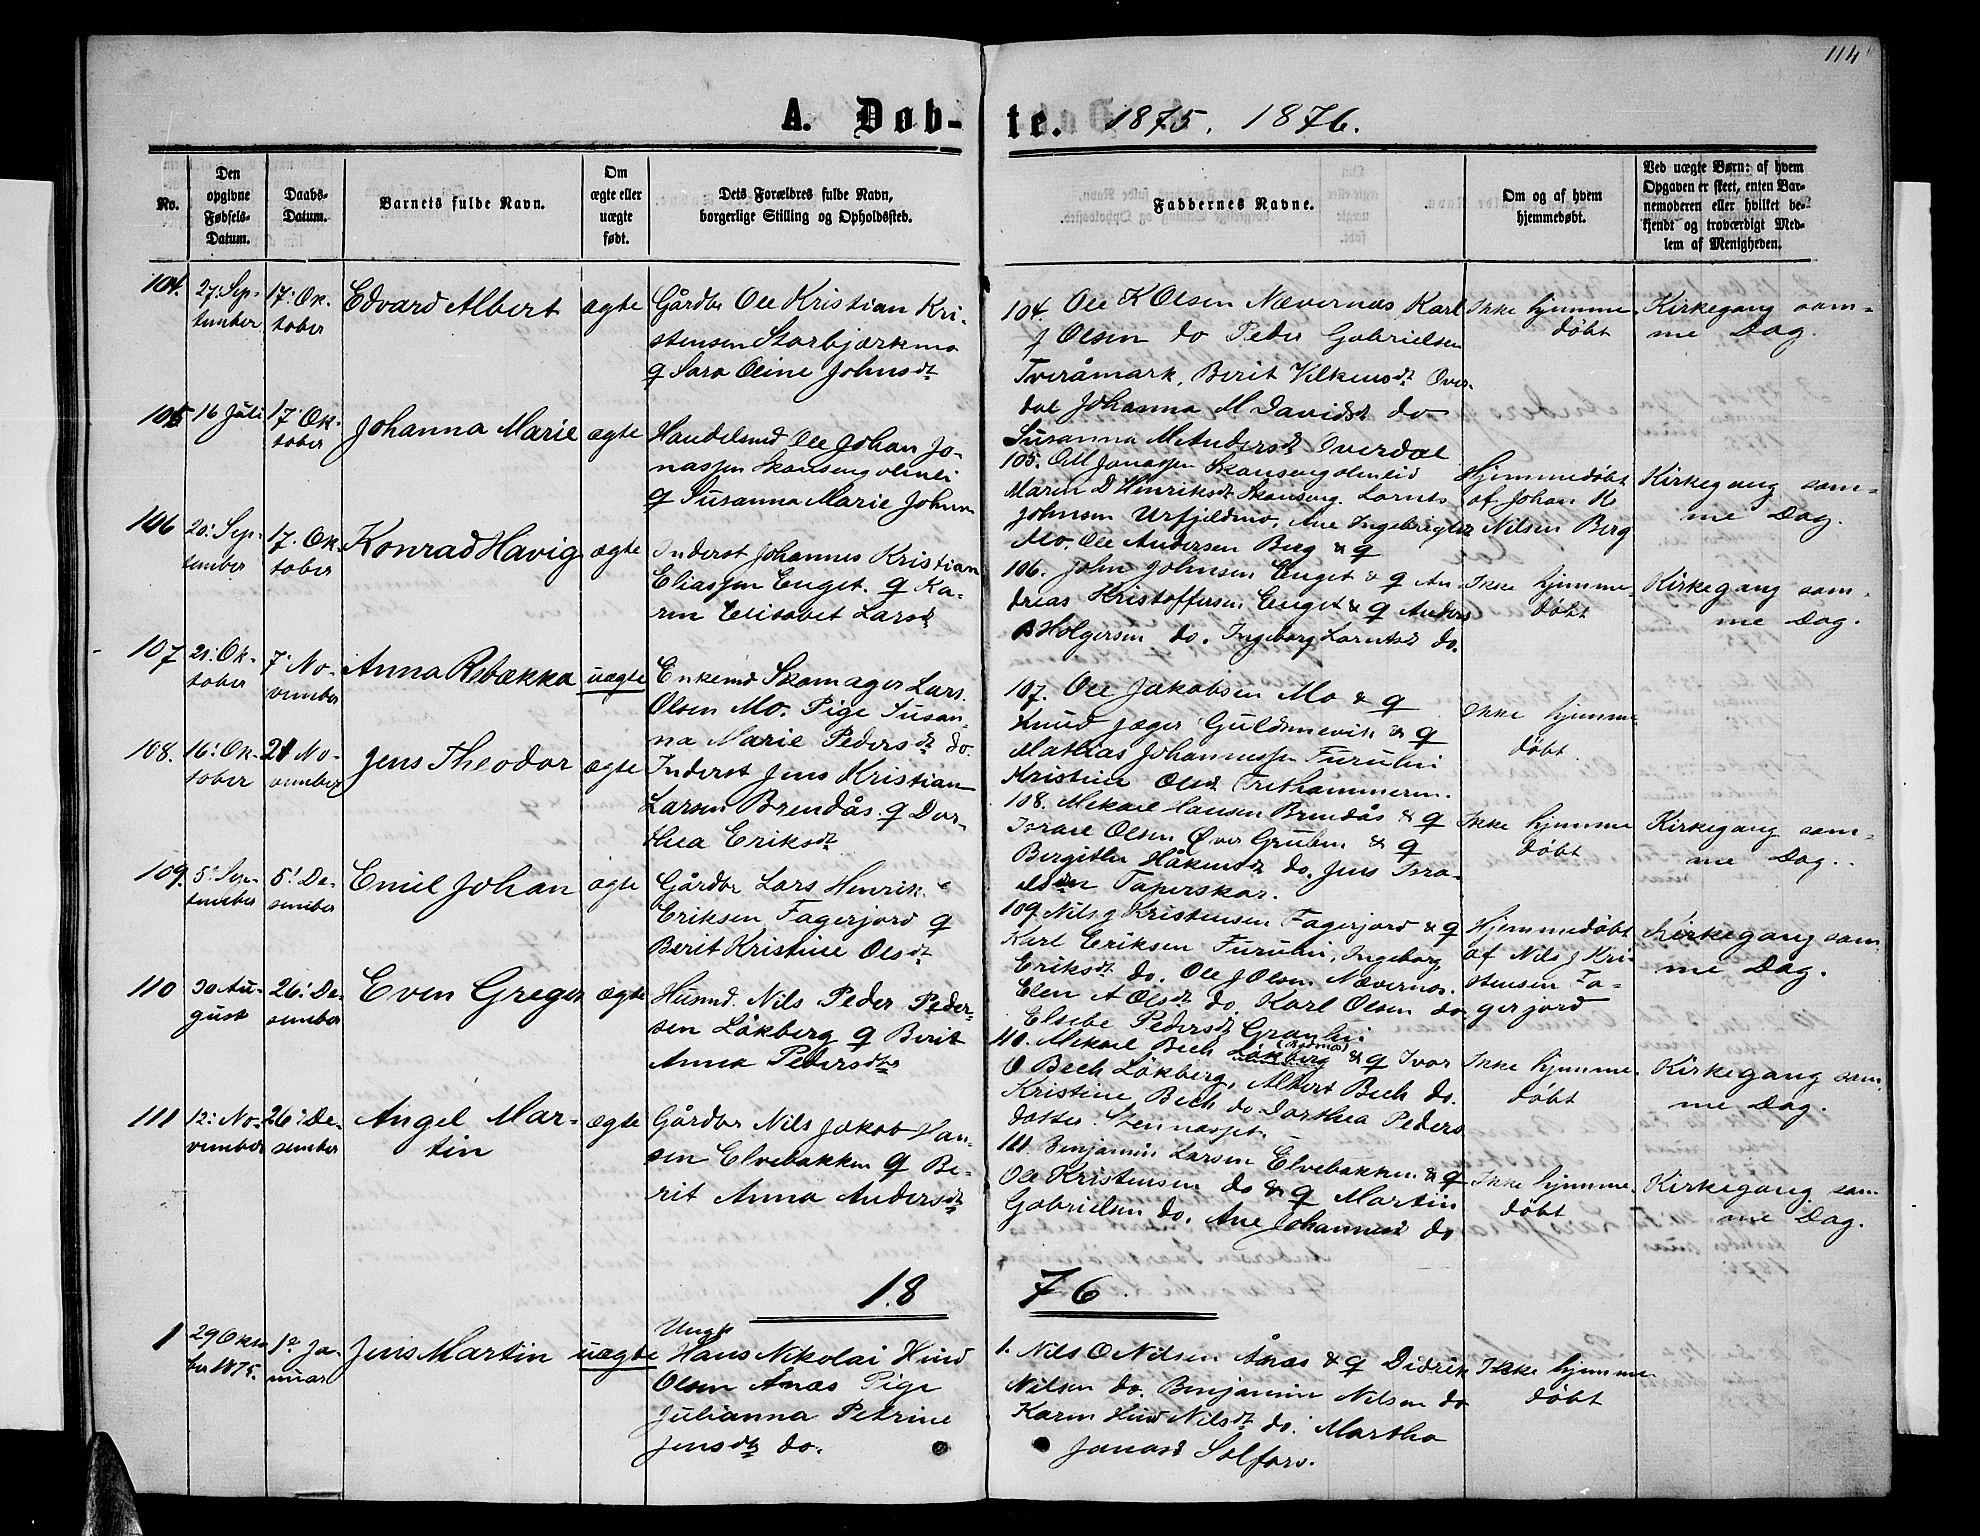 SAT, Ministerialprotokoller, klokkerbøker og fødselsregistre - Nordland, 827/L0415: Klokkerbok nr. 827C04, 1864-1886, s. 114